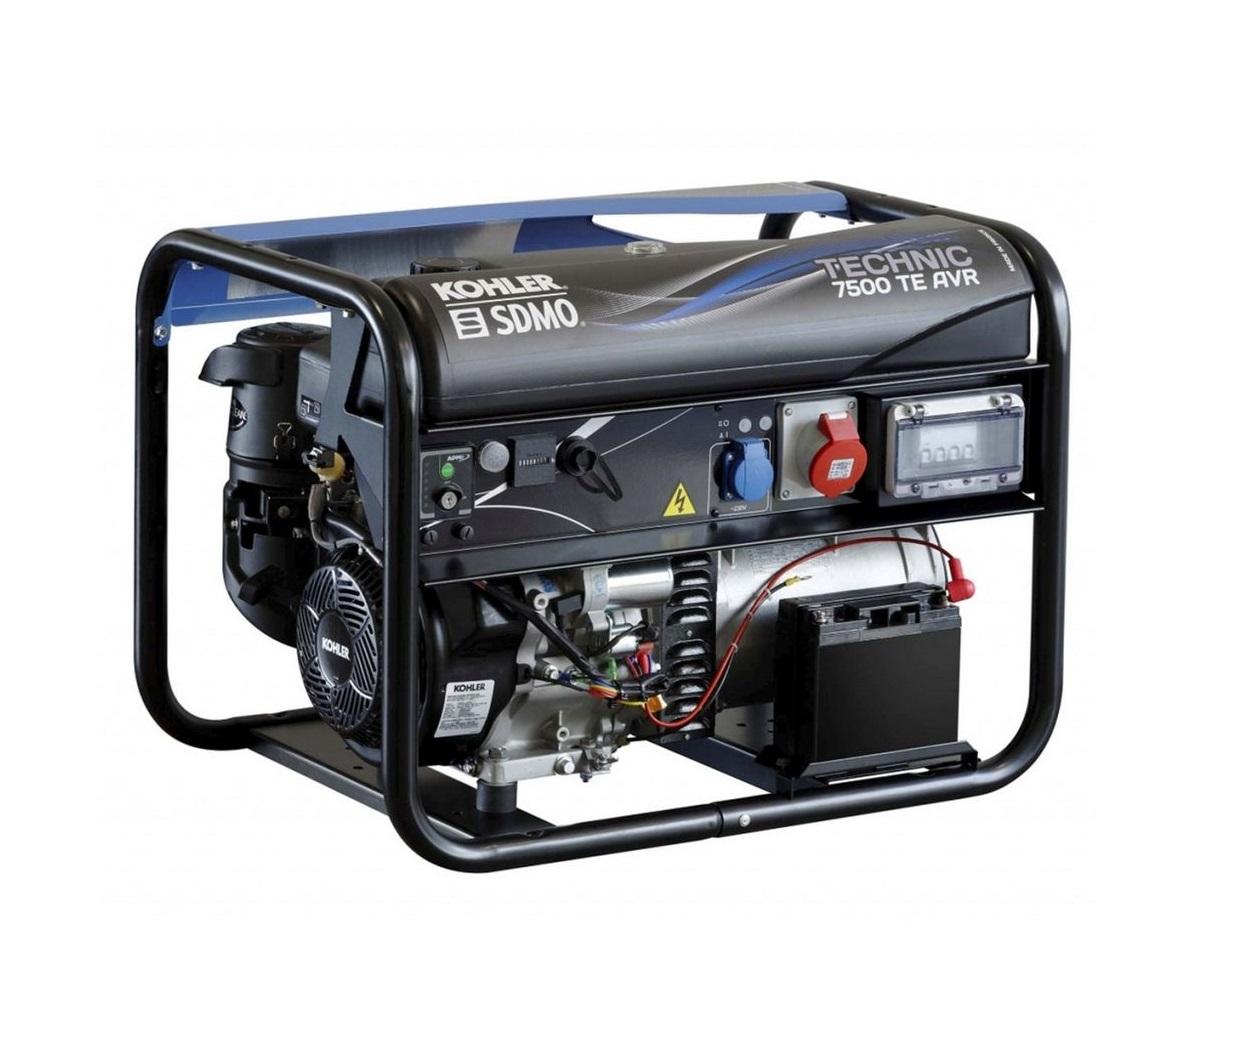 Бензиновый генератор (Бензогенератор) SDMO TECHNIC 7500 TE AVR